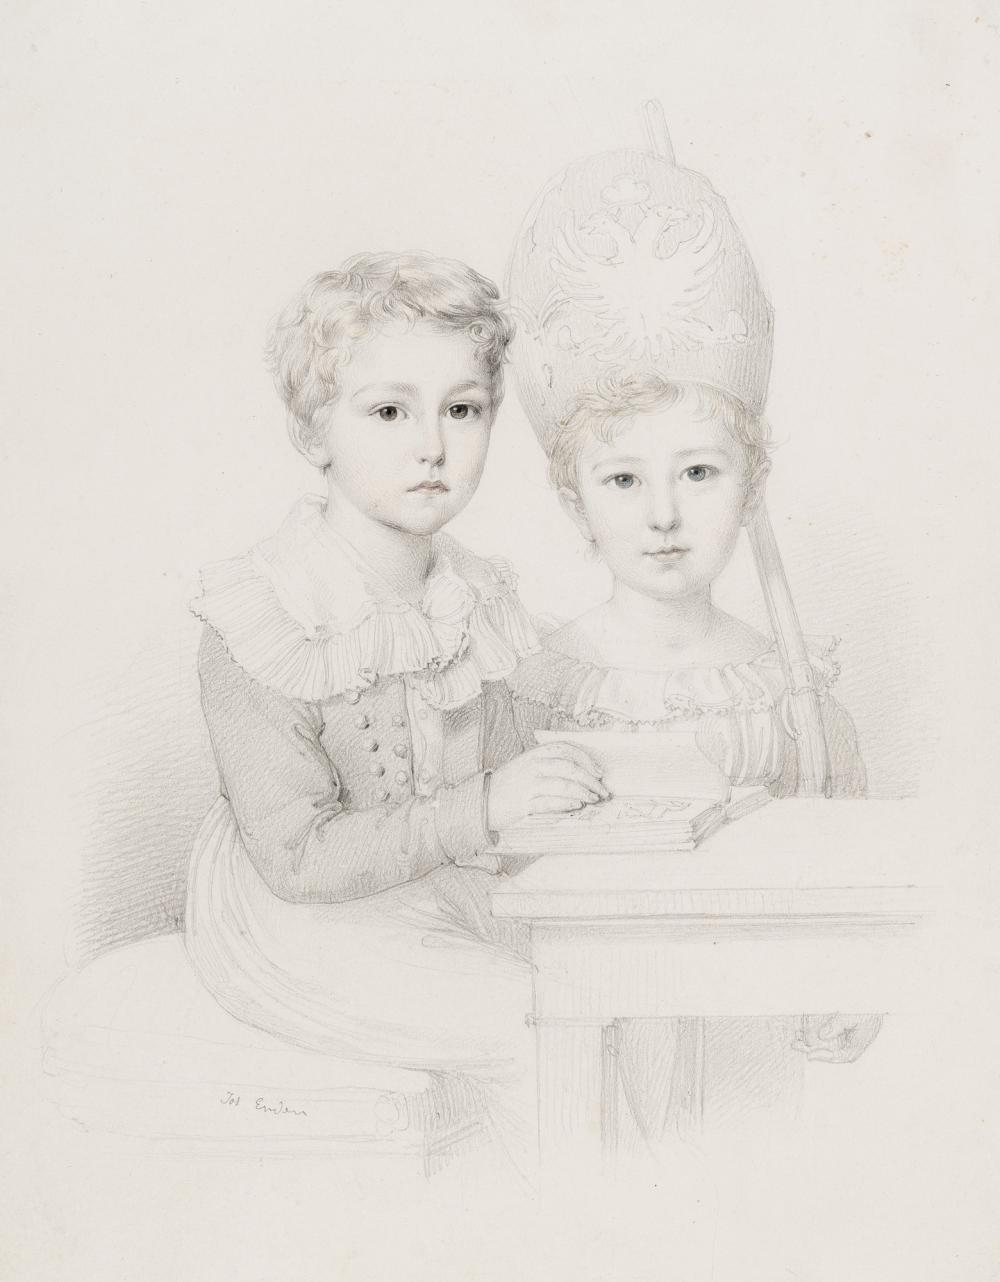 Johann Nepomuk Ender – Zwei Kinder des Grafen Széchényi